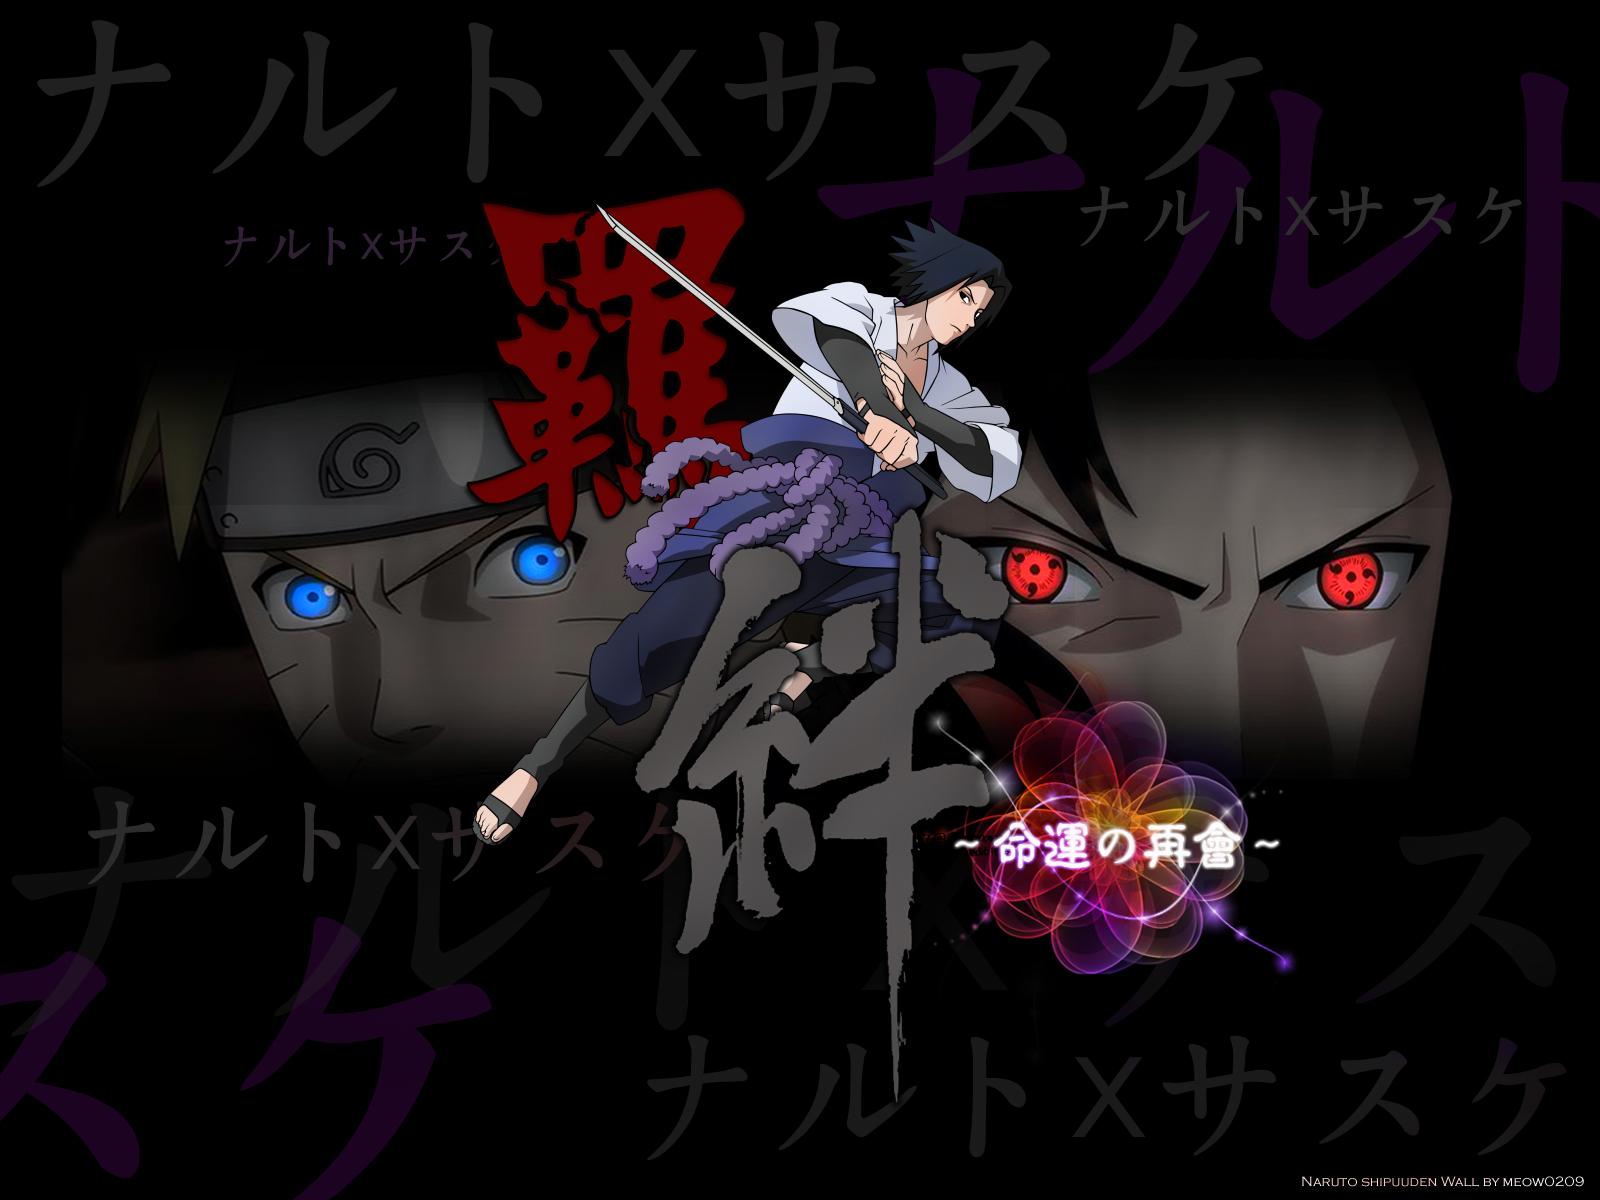 Fonds D Ecran Minitokyo Naruto Telecharger Sgeselquiton Ml